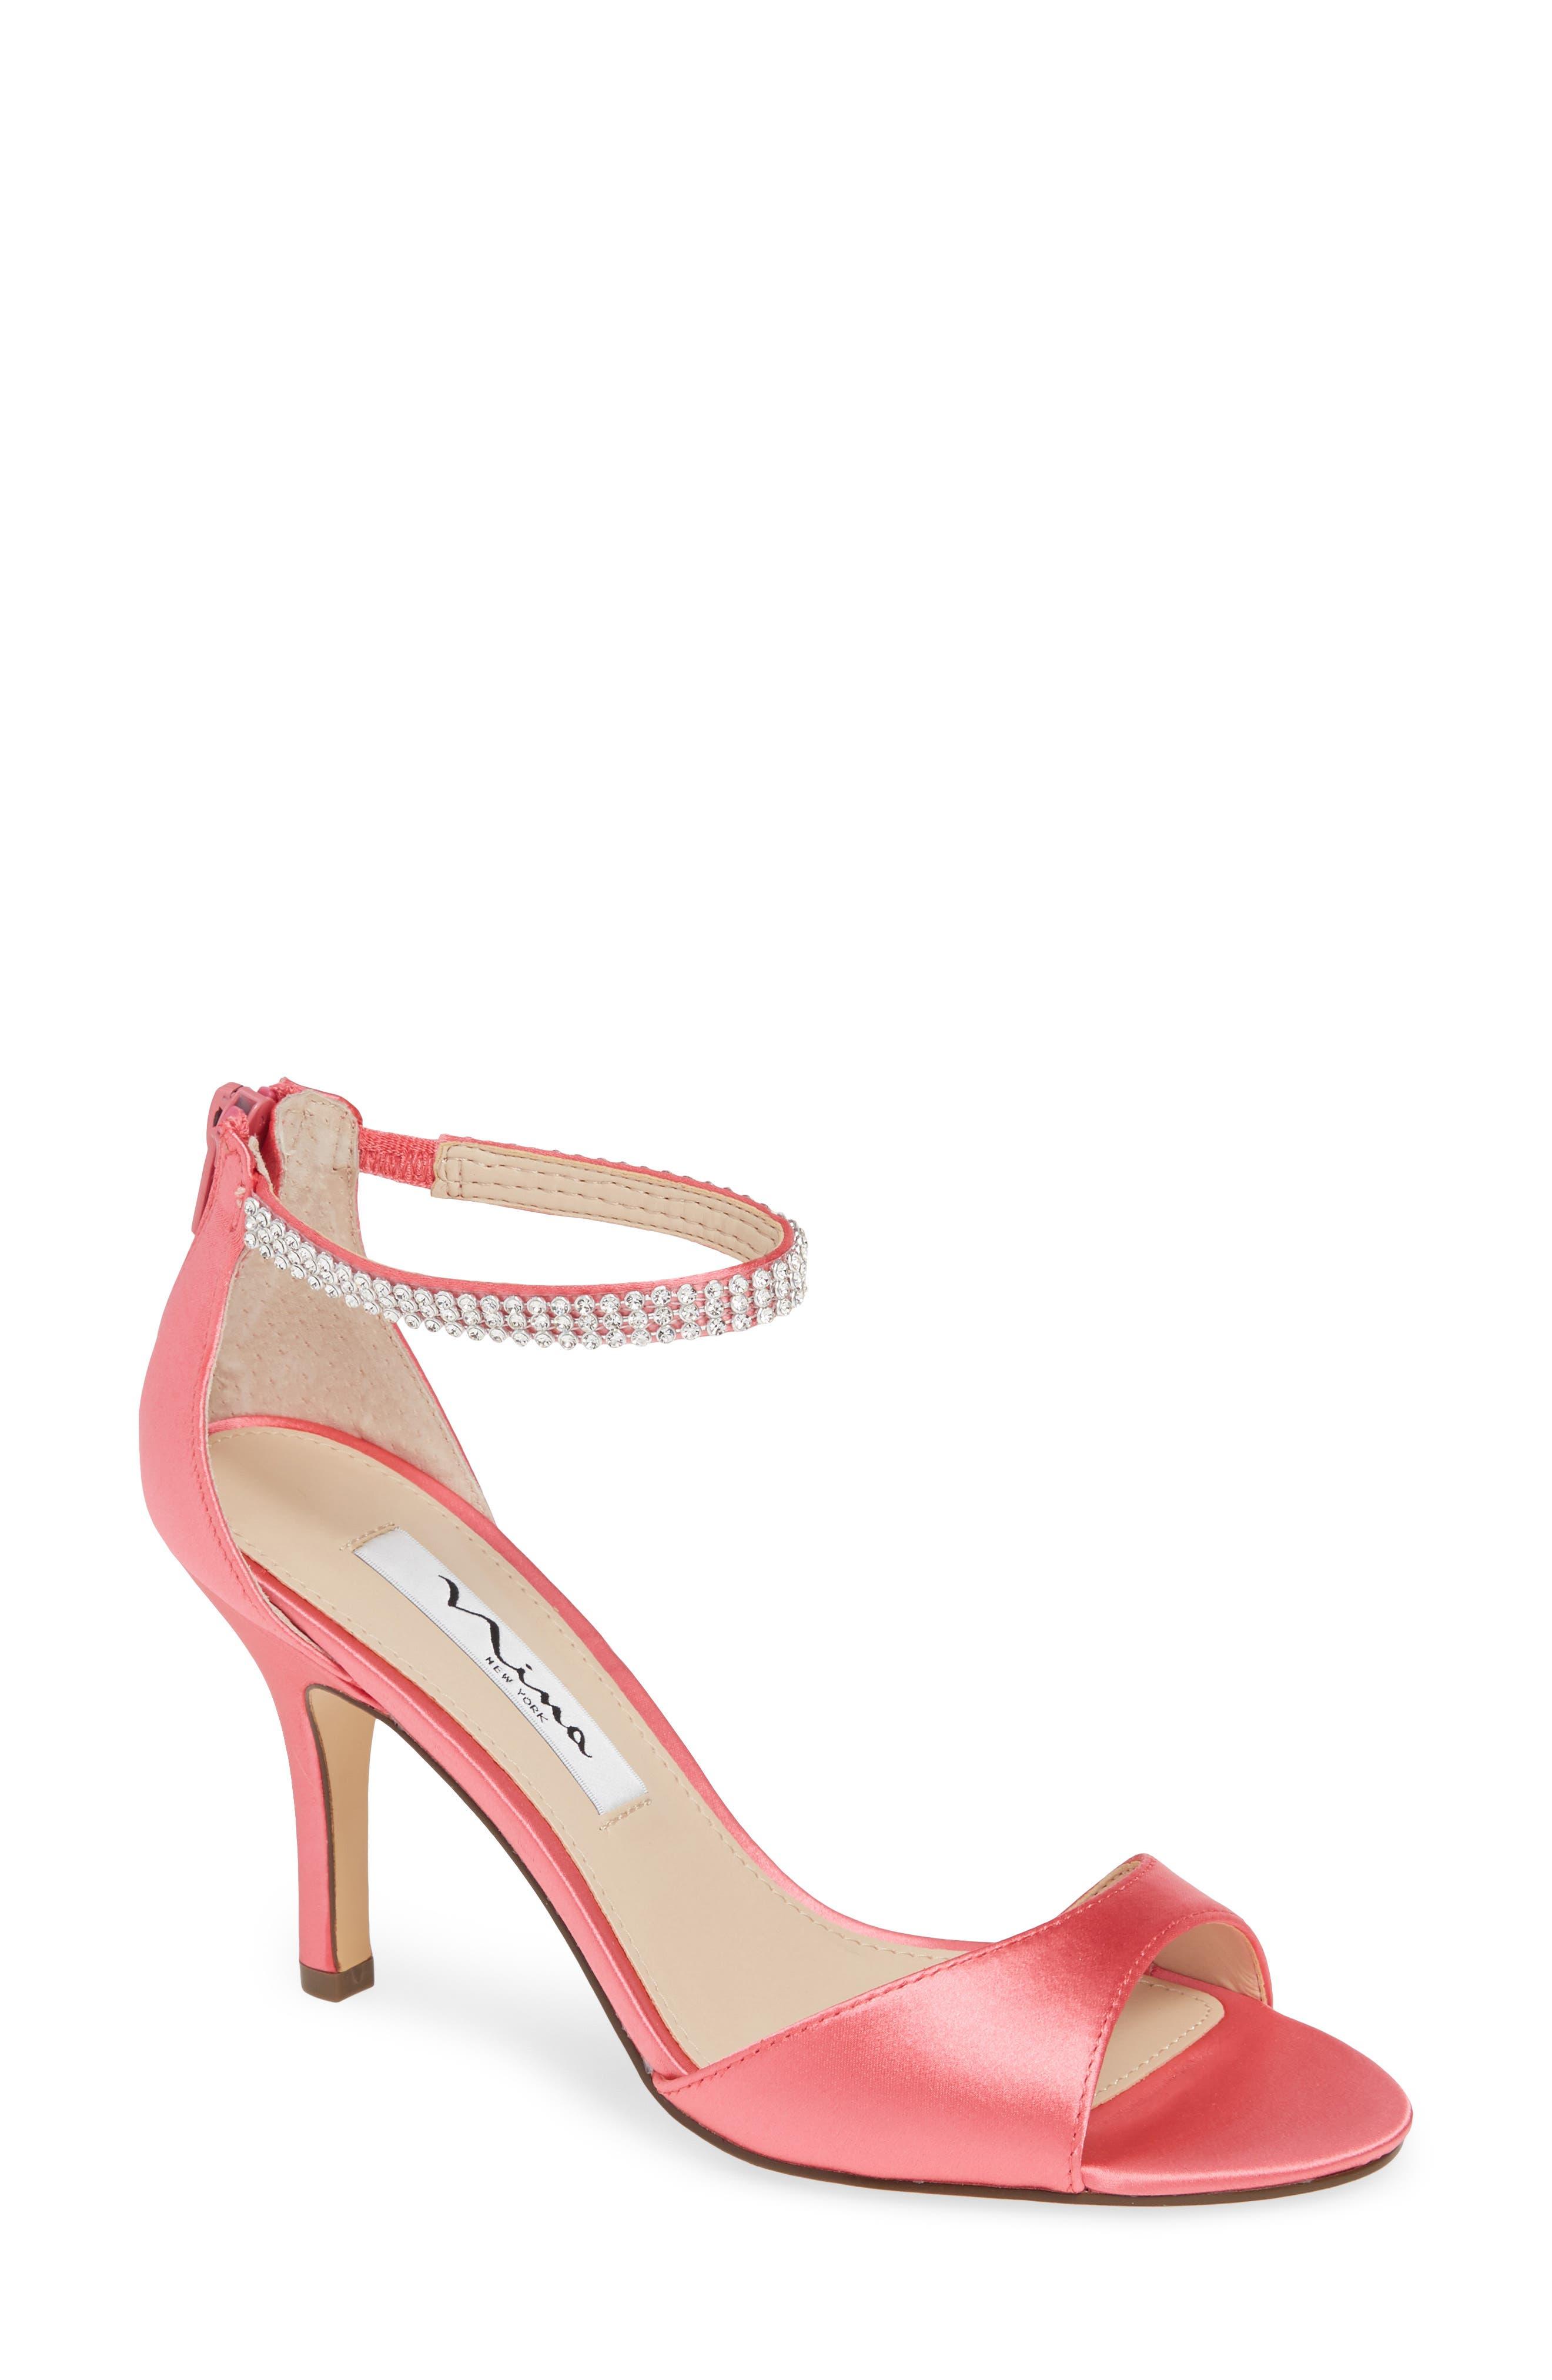 NINA, Volanda Ankle Strap Sandal, Main thumbnail 1, color, STRAWBERRY PUNCH SATIN